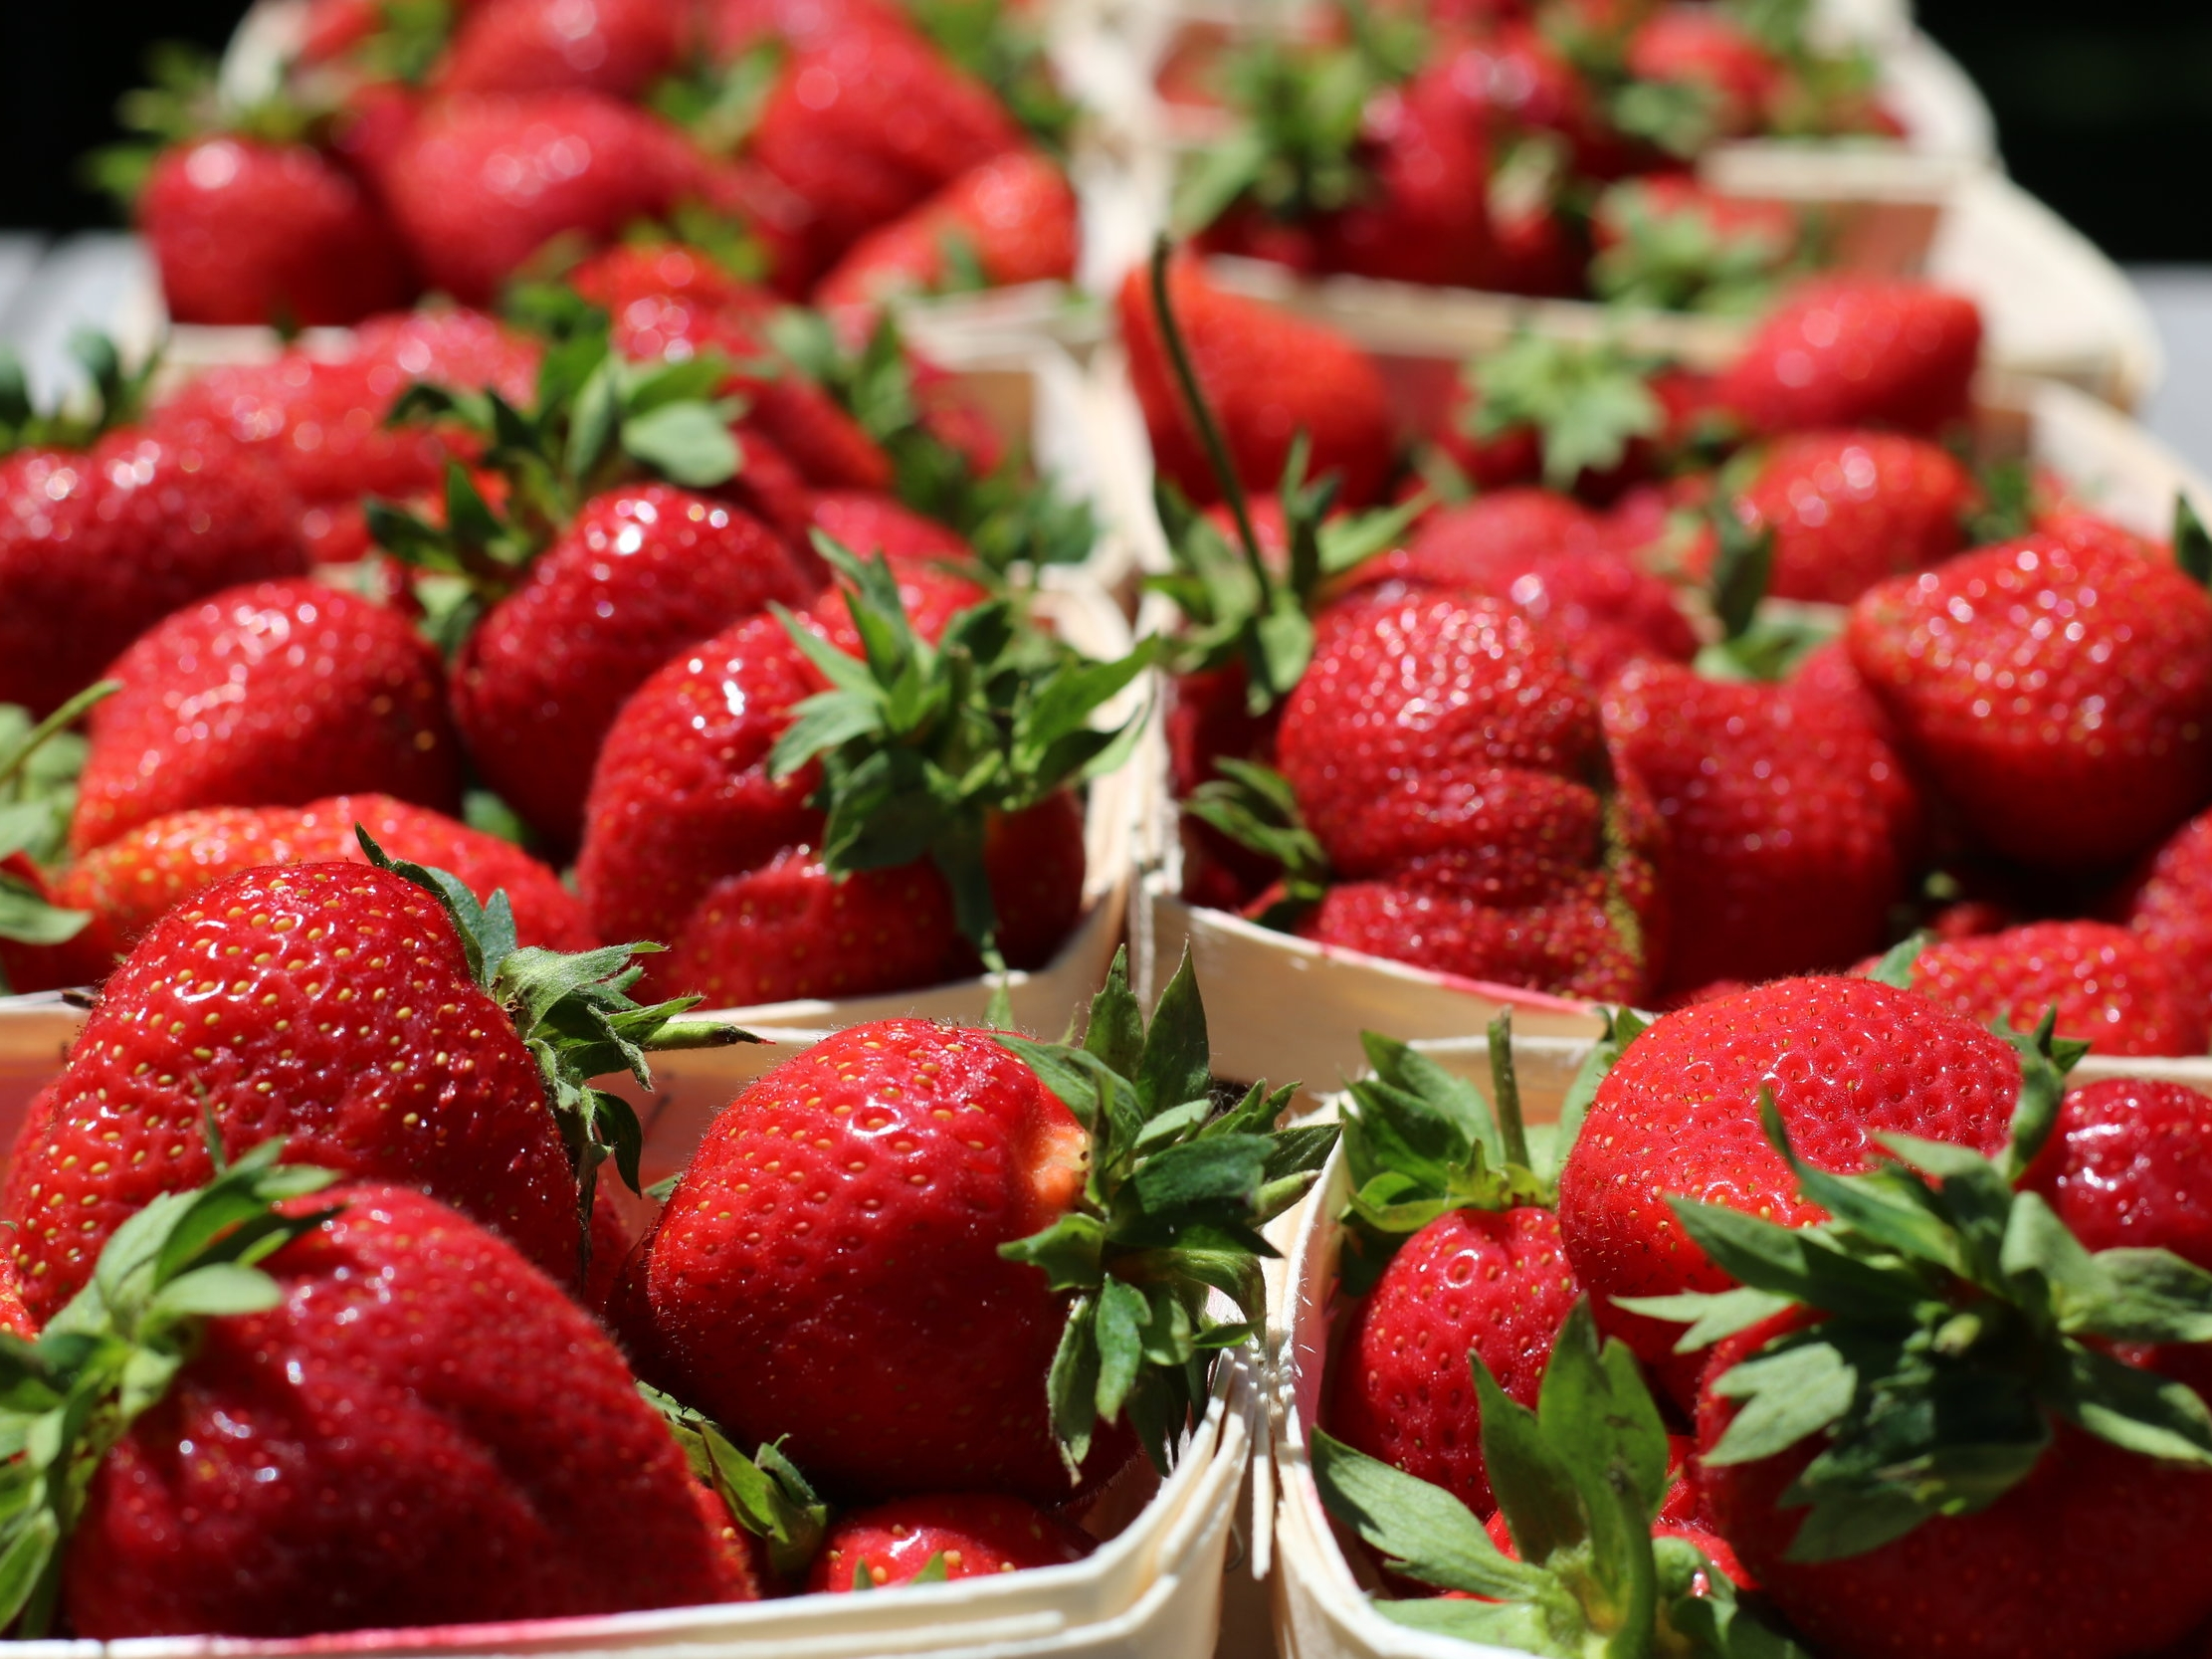 Verrill Farm Strawberries - Celebration of Strawberries